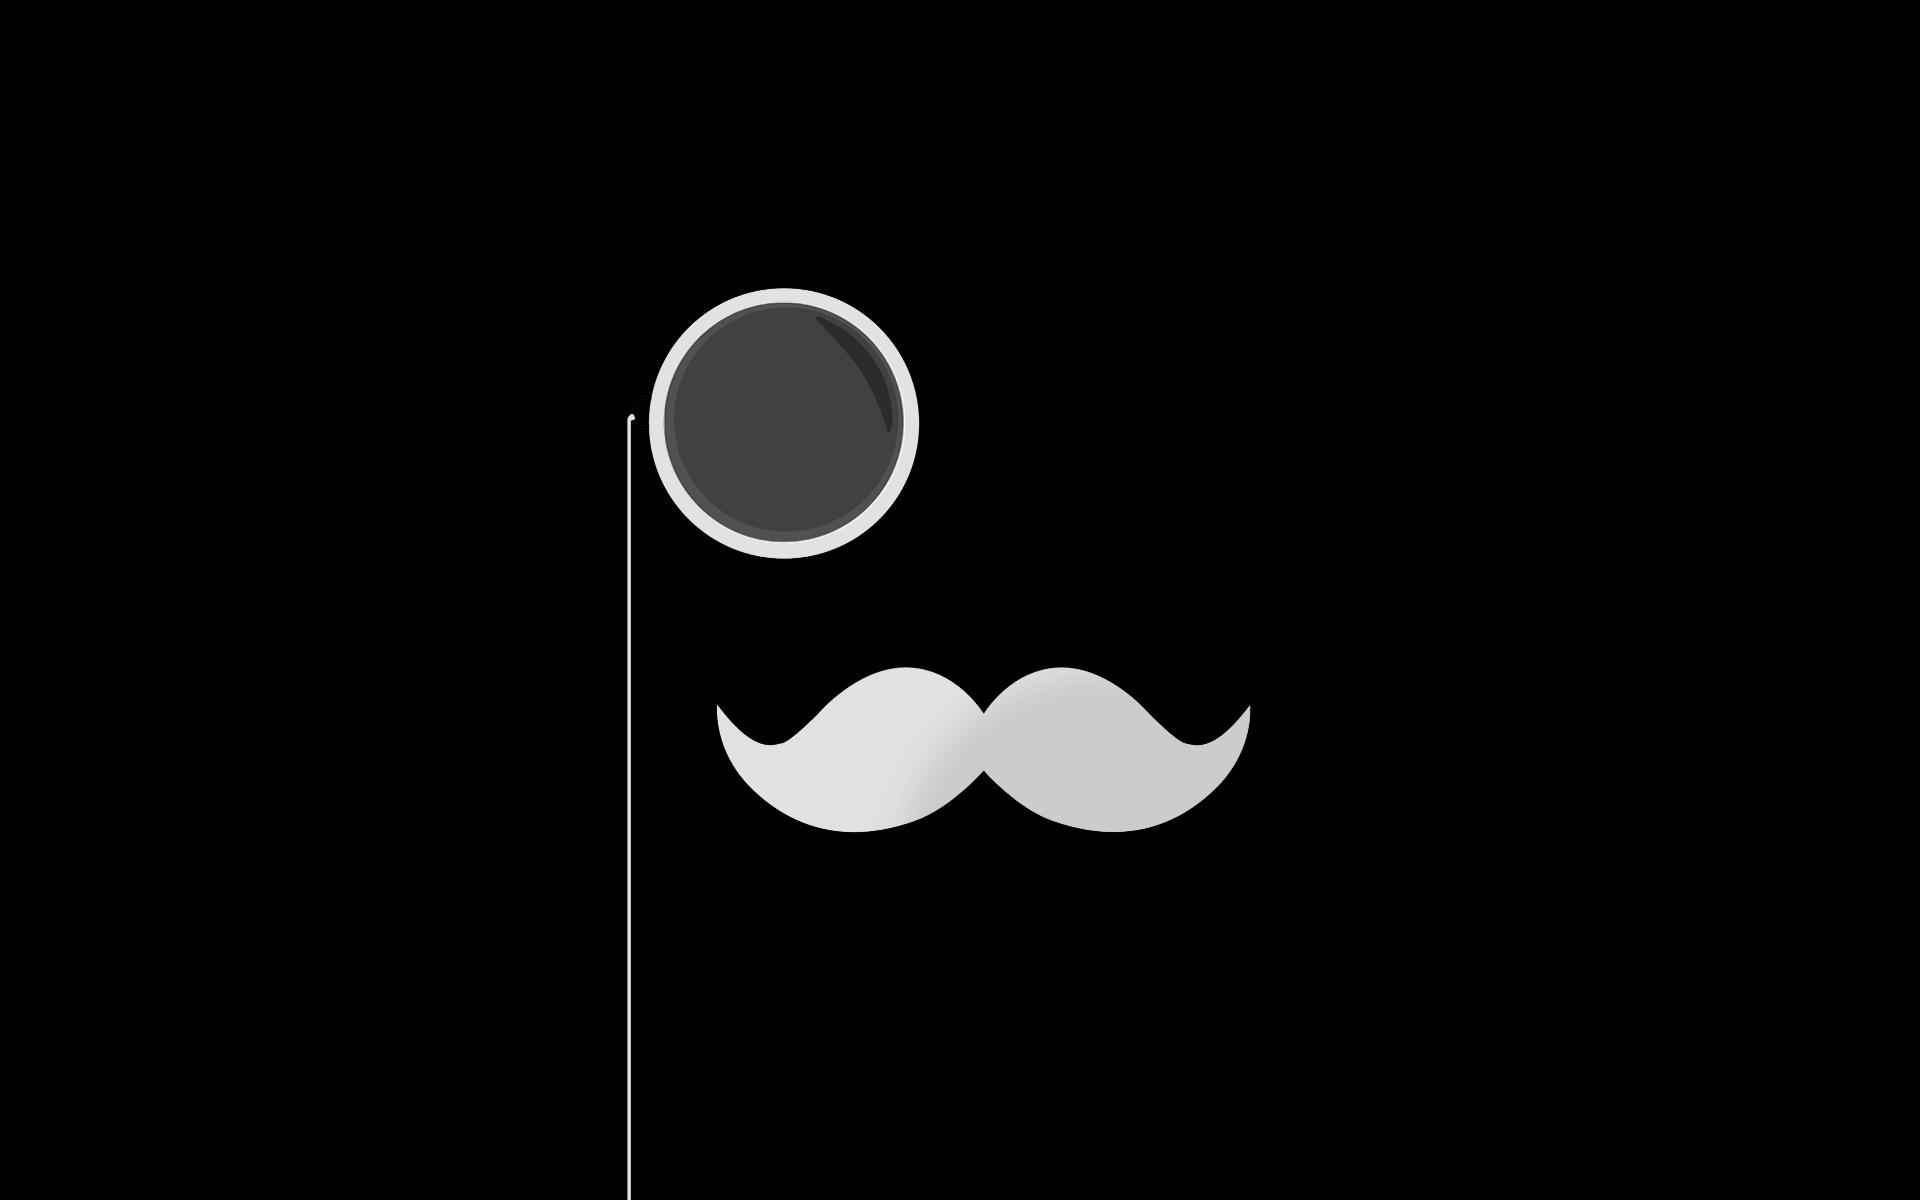 Mustache Wallpaper 1920x1200 20 Wallpapers